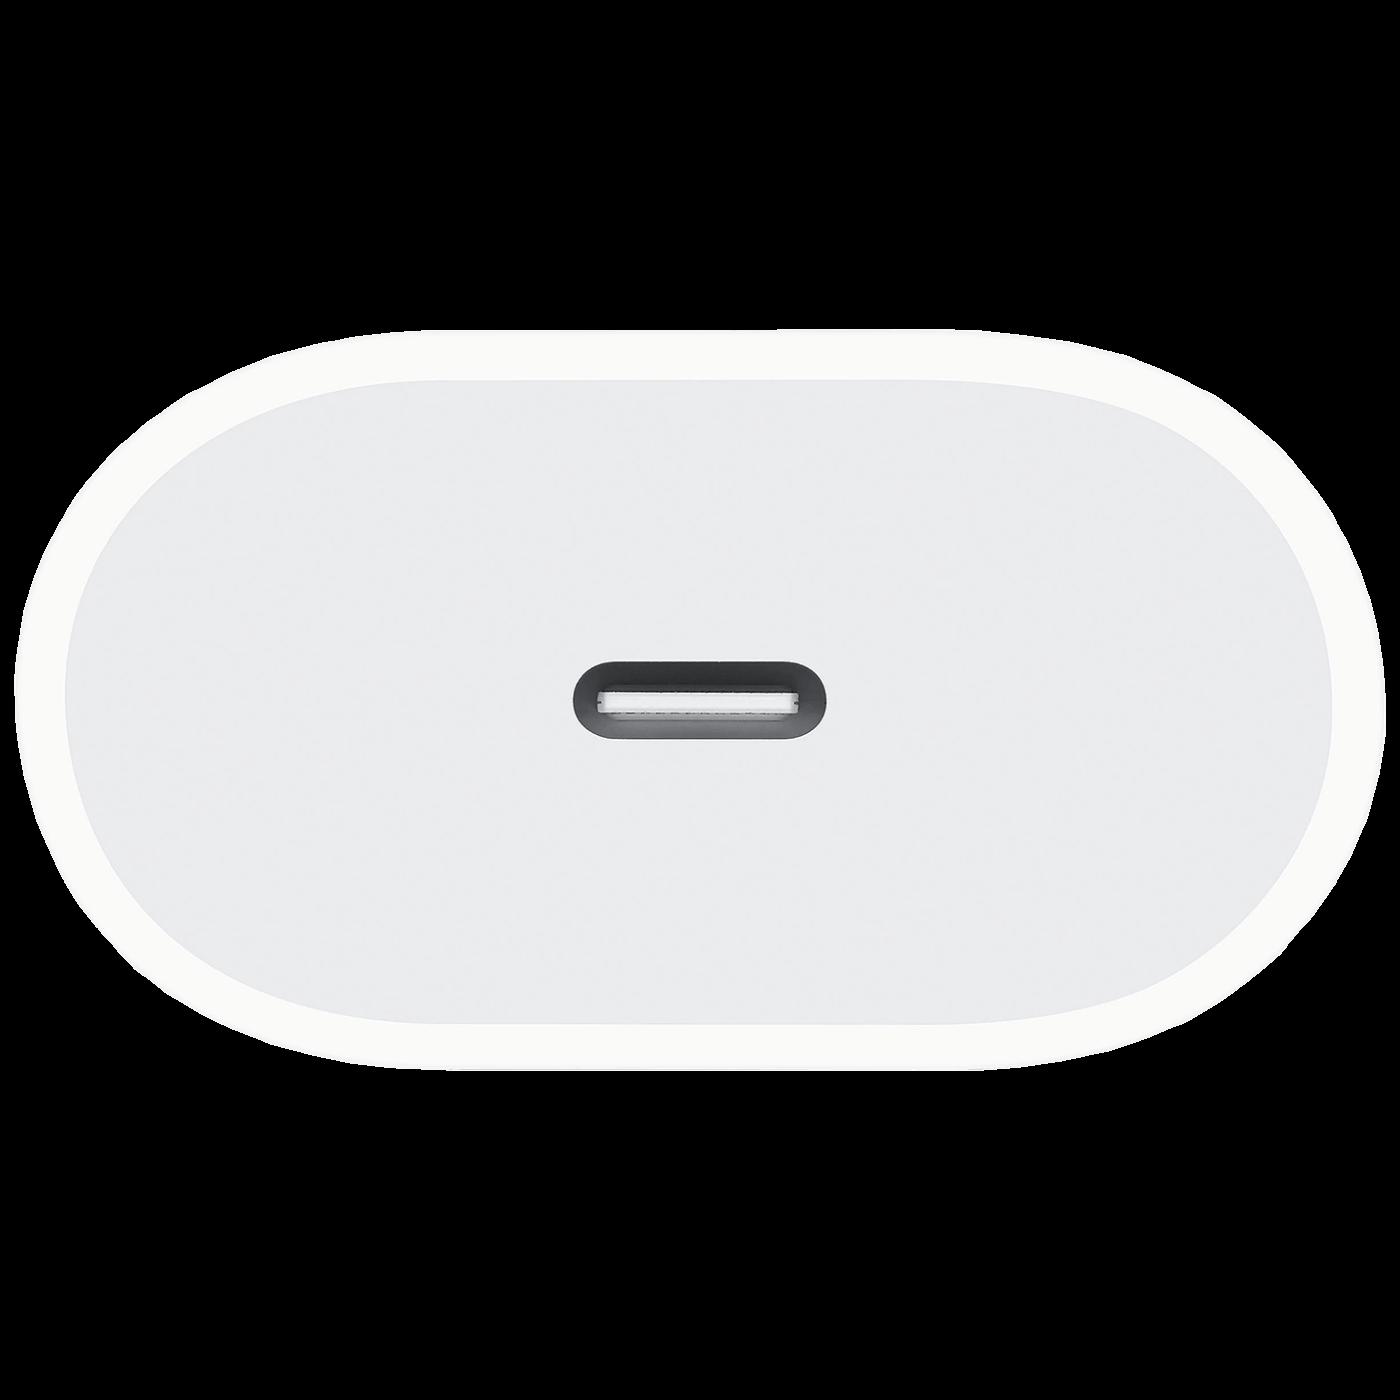 USB-C 20W Power Adapter